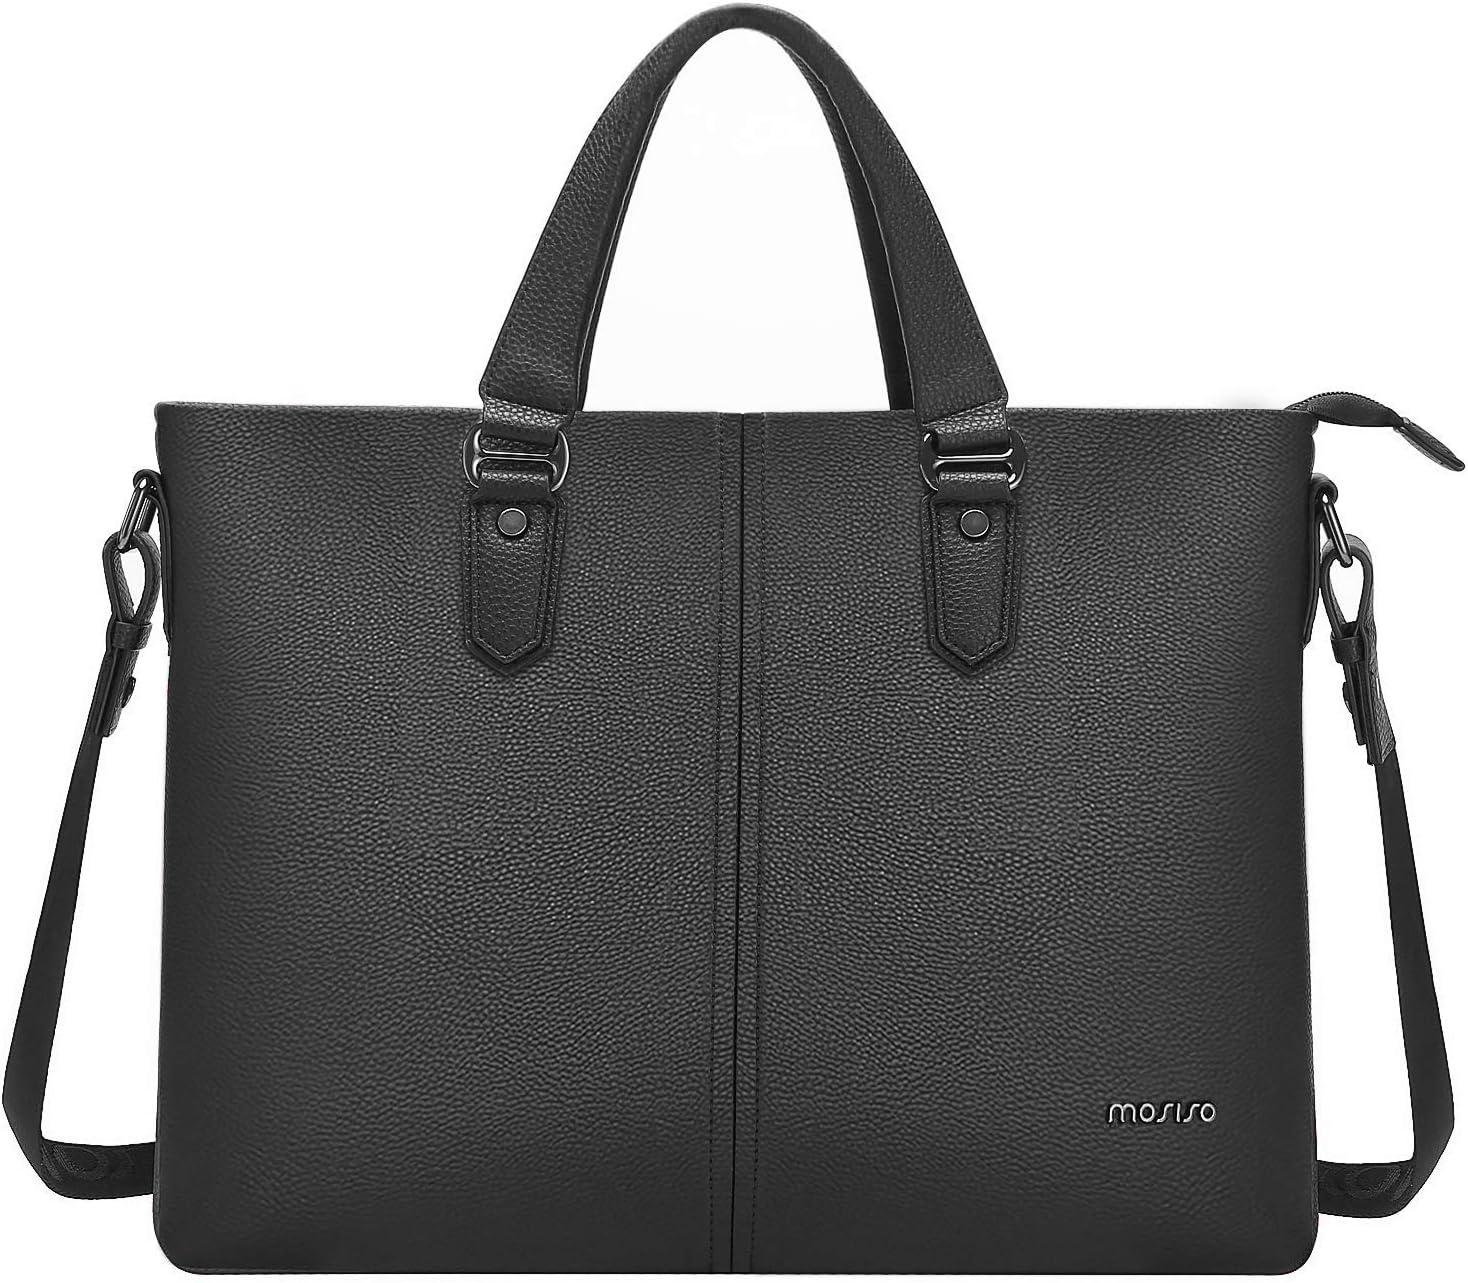 MOSISO 15.6 inch Laptop Messenger Shoulder Bag, Business Office Bag for Men Women, Water Resistant Premium PU Leather Briefcase Handbag Carrying Case Compatible with MacBook Acer HP Dell Lenovo, Black